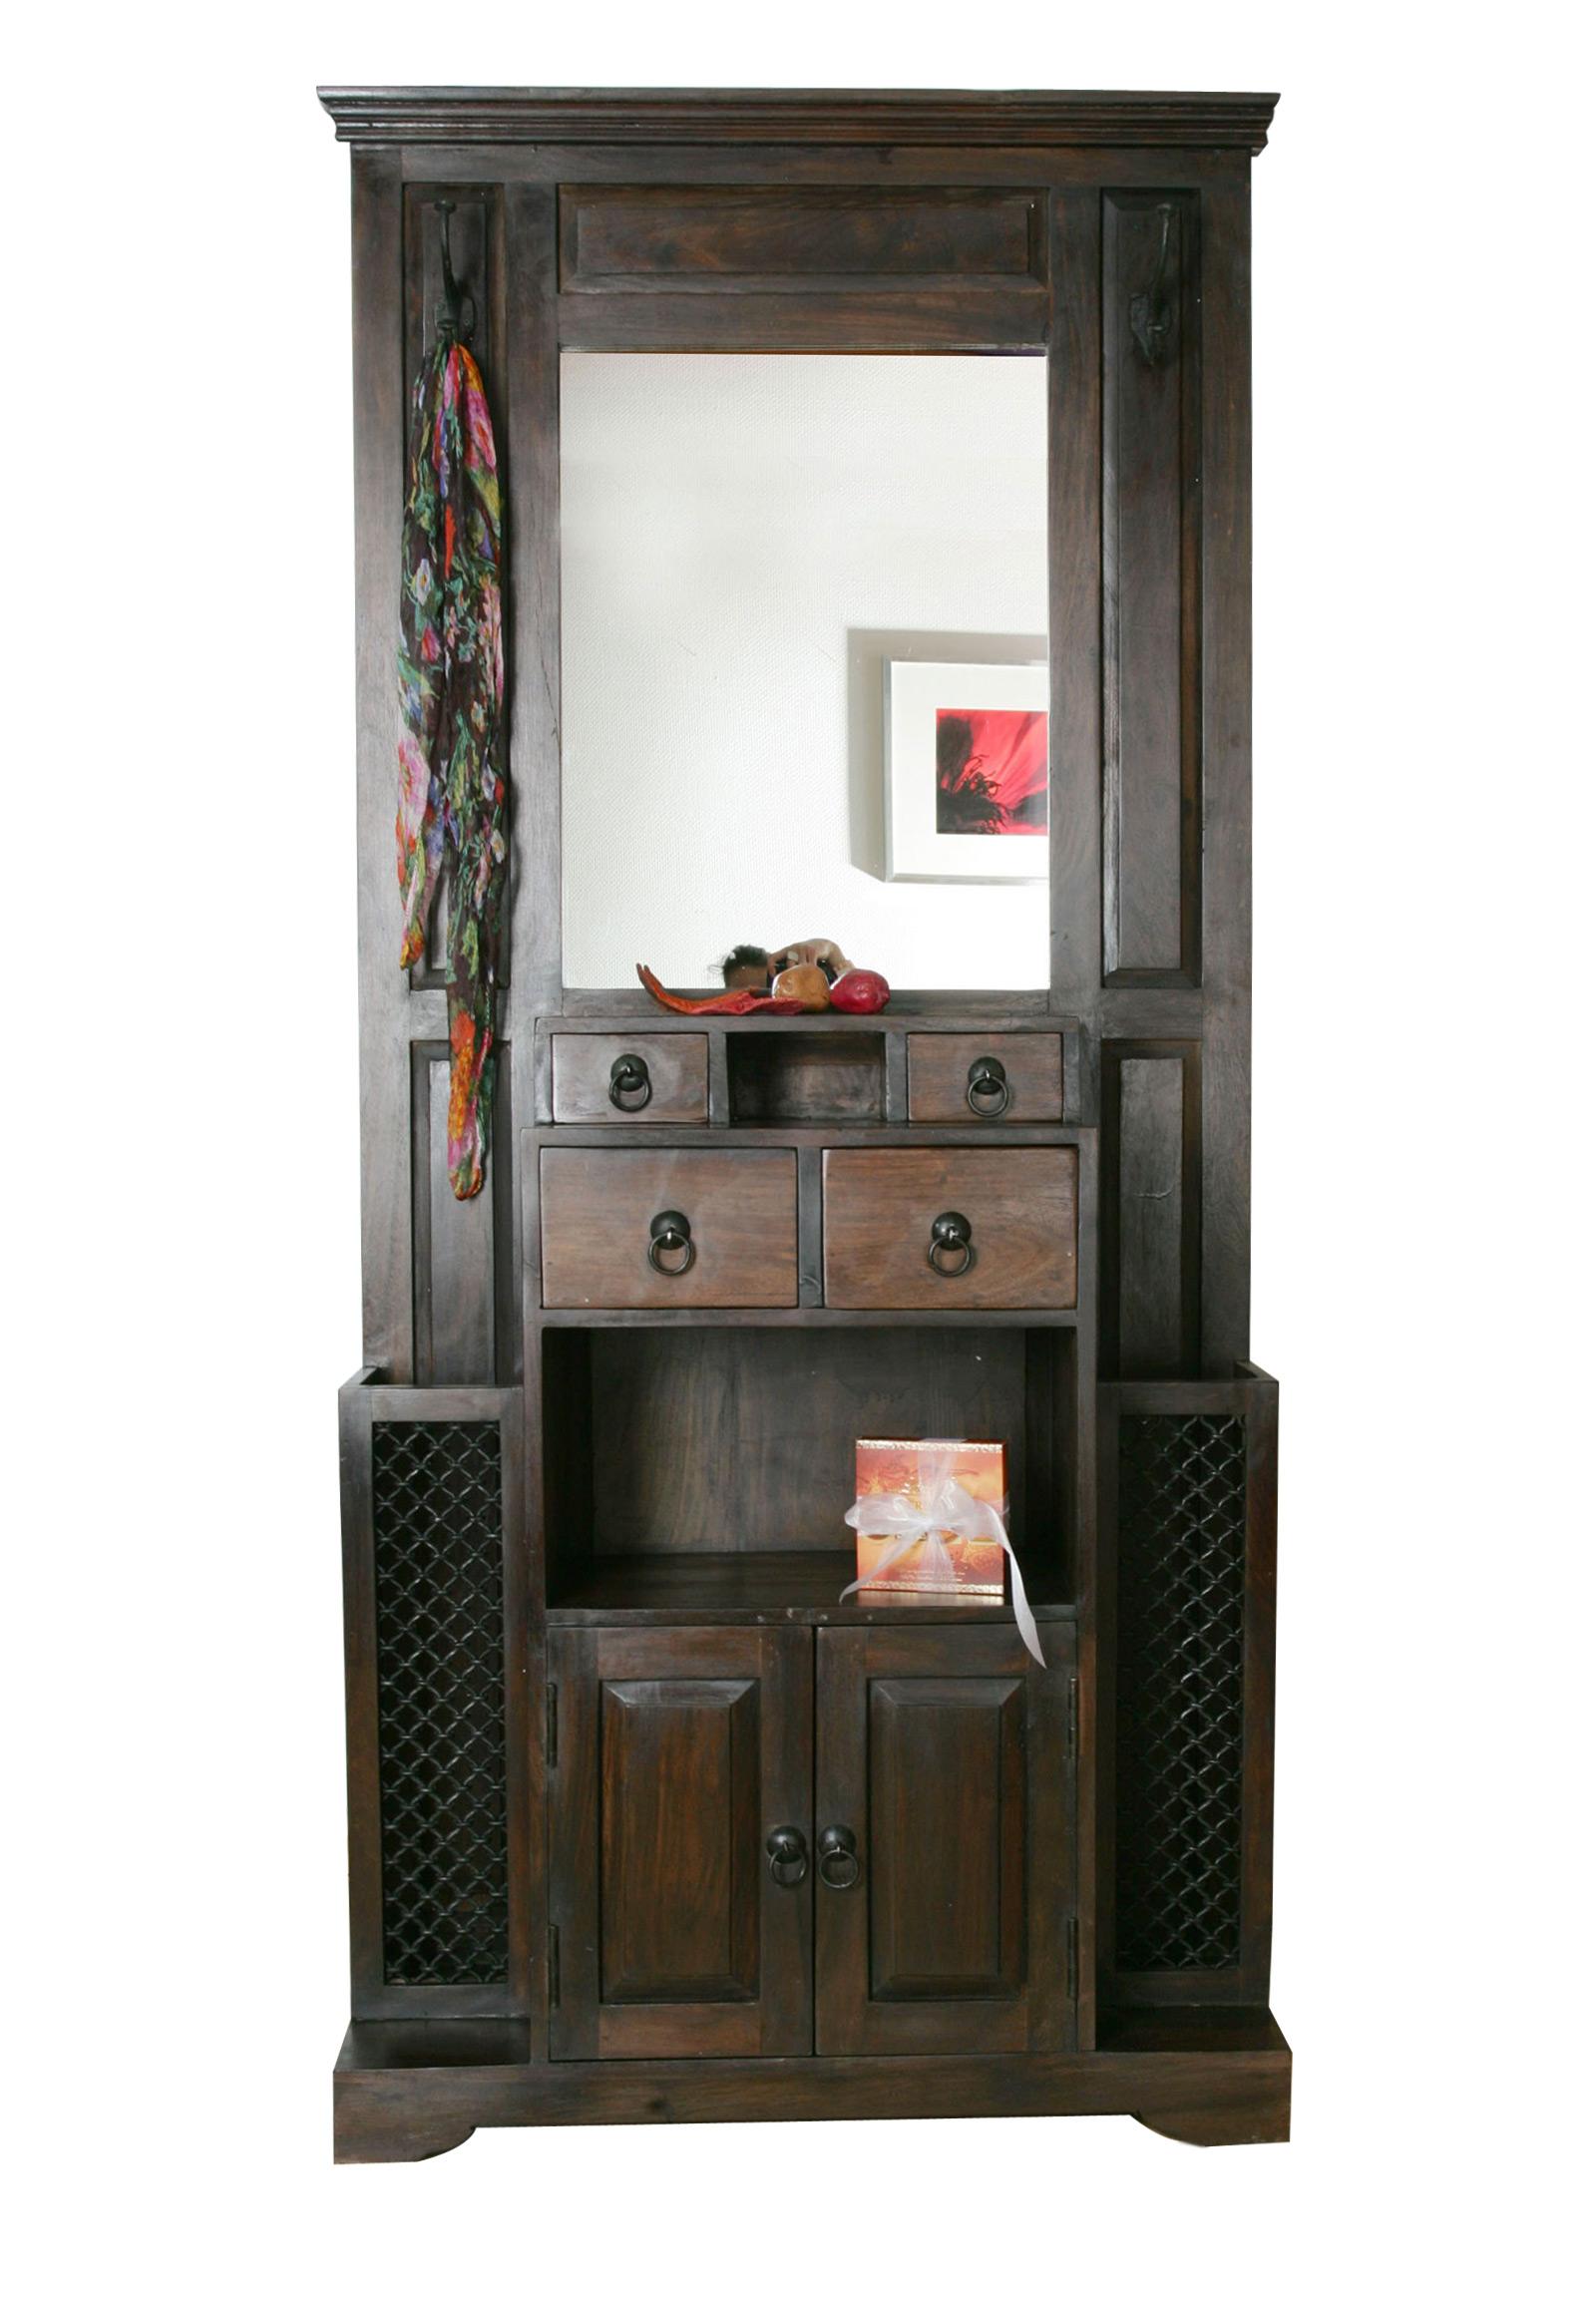 schrank garderobe fabulous ibis muenchen city arnulfpark with schrank garderobe top schrank. Black Bedroom Furniture Sets. Home Design Ideas